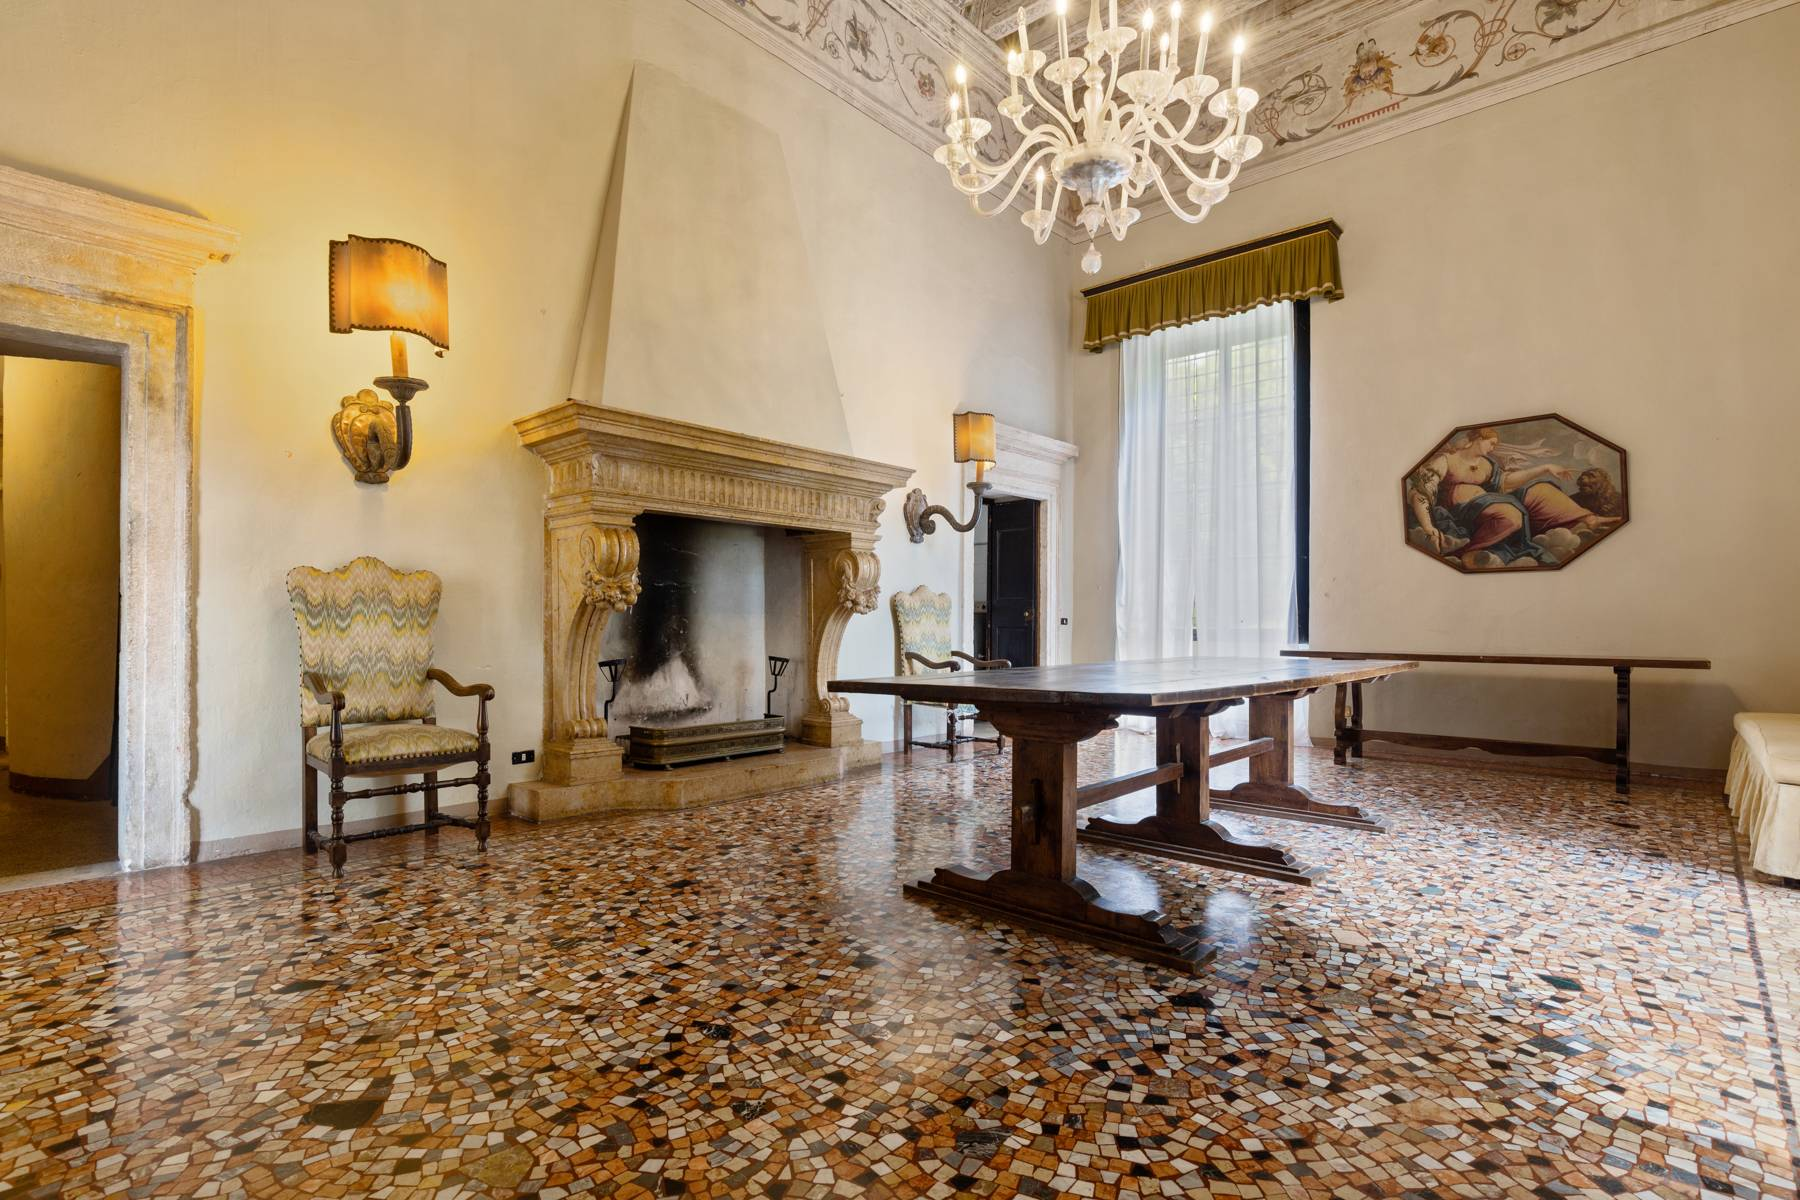 Villa in Vendita a Verona: 5 locali, 2400 mq - Foto 17